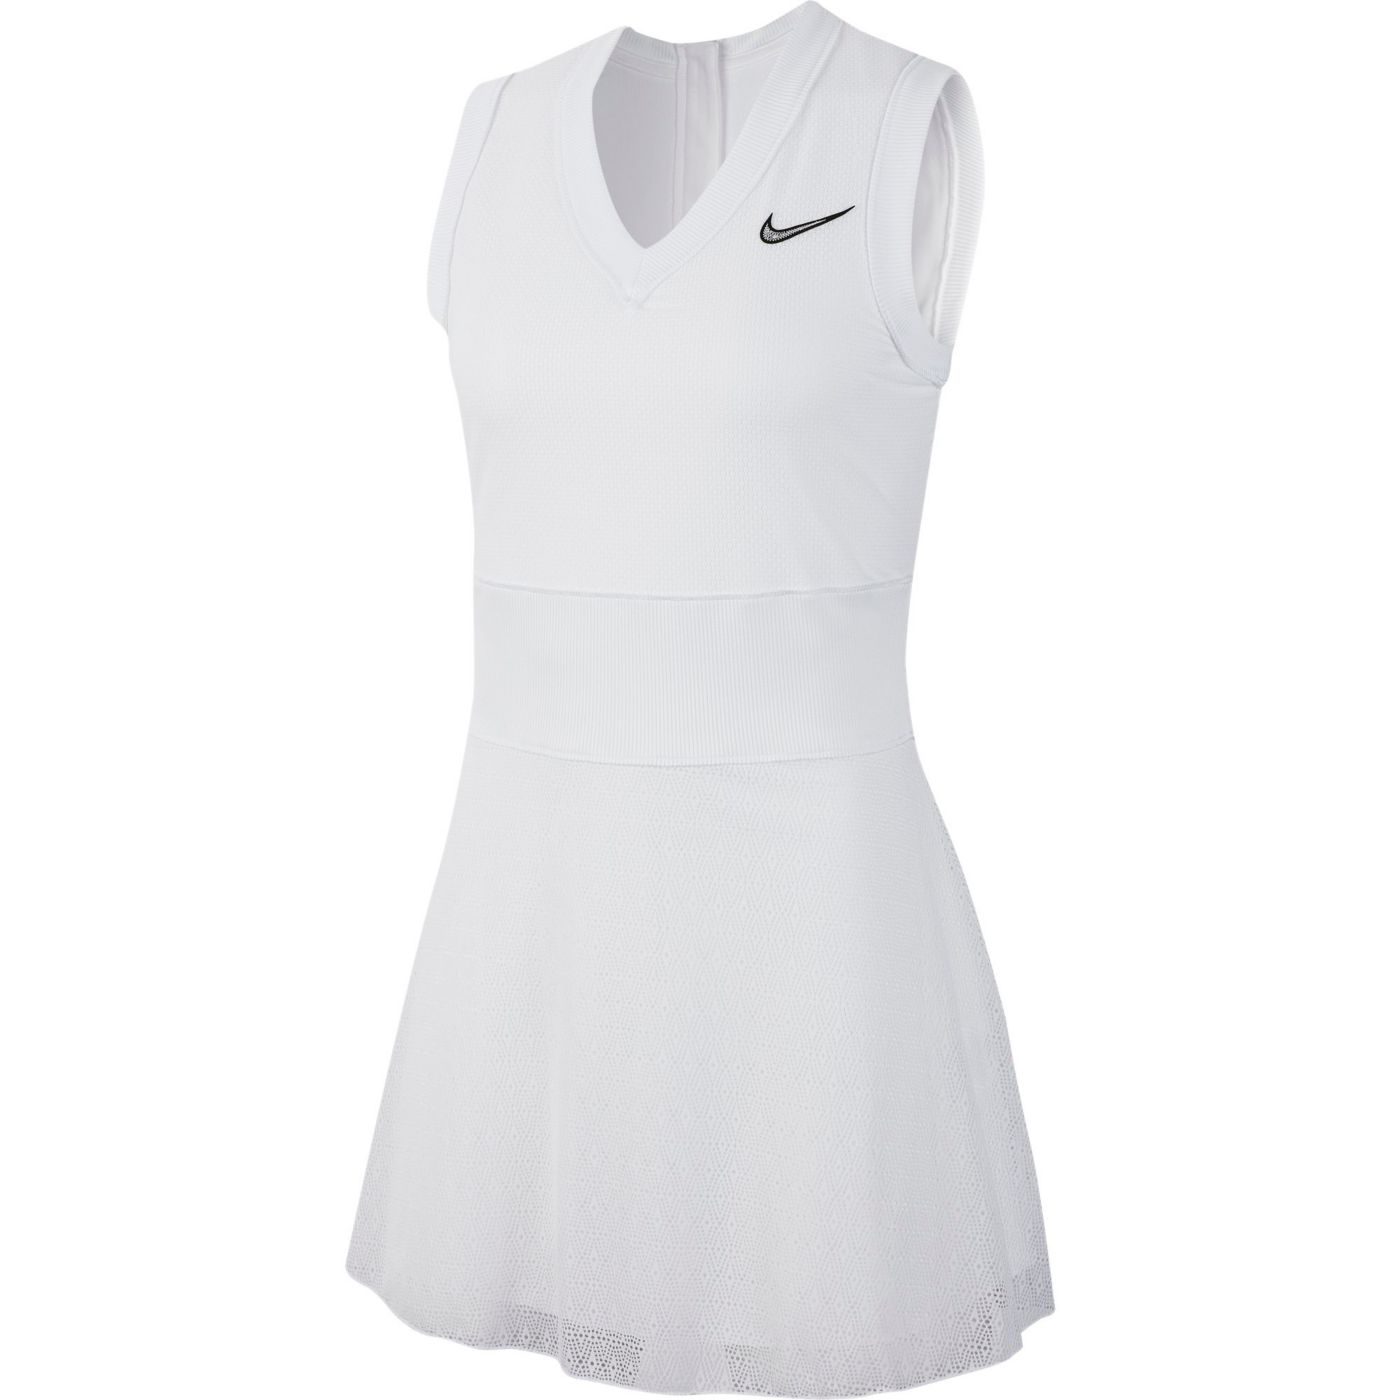 Nike Women's Court Slam Tennis Dress